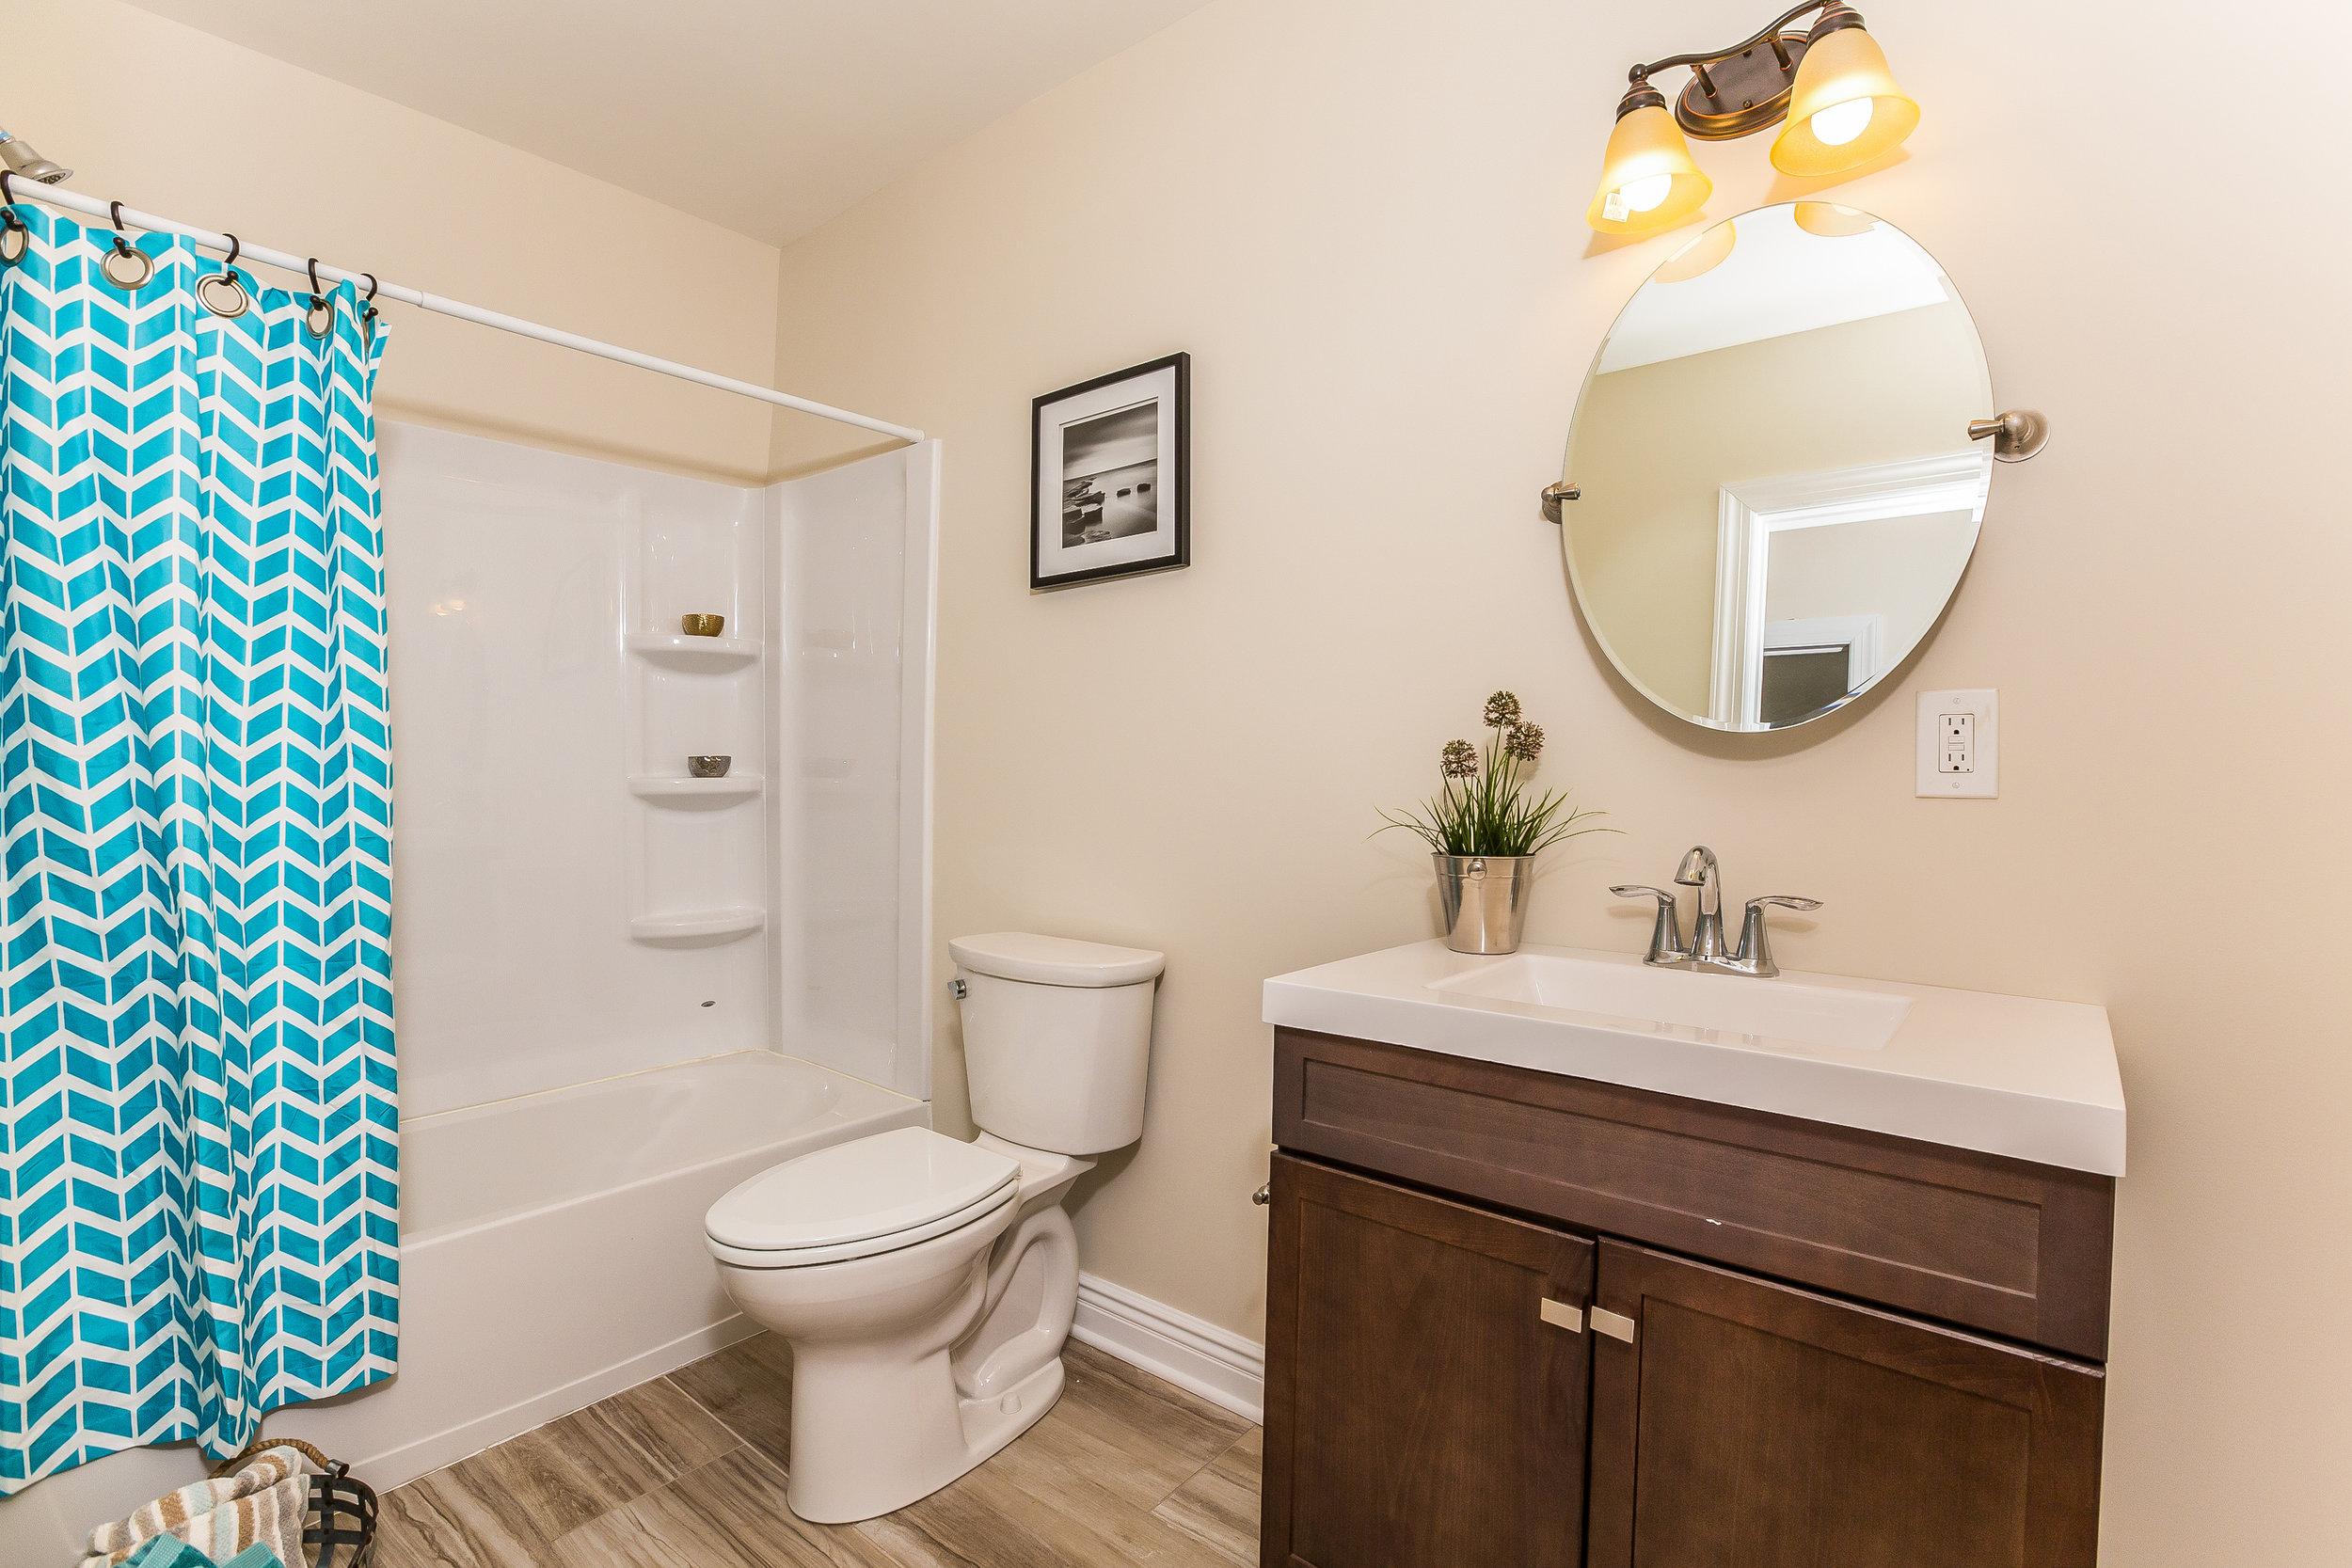 057-Bathroom-3992673-large.jpg